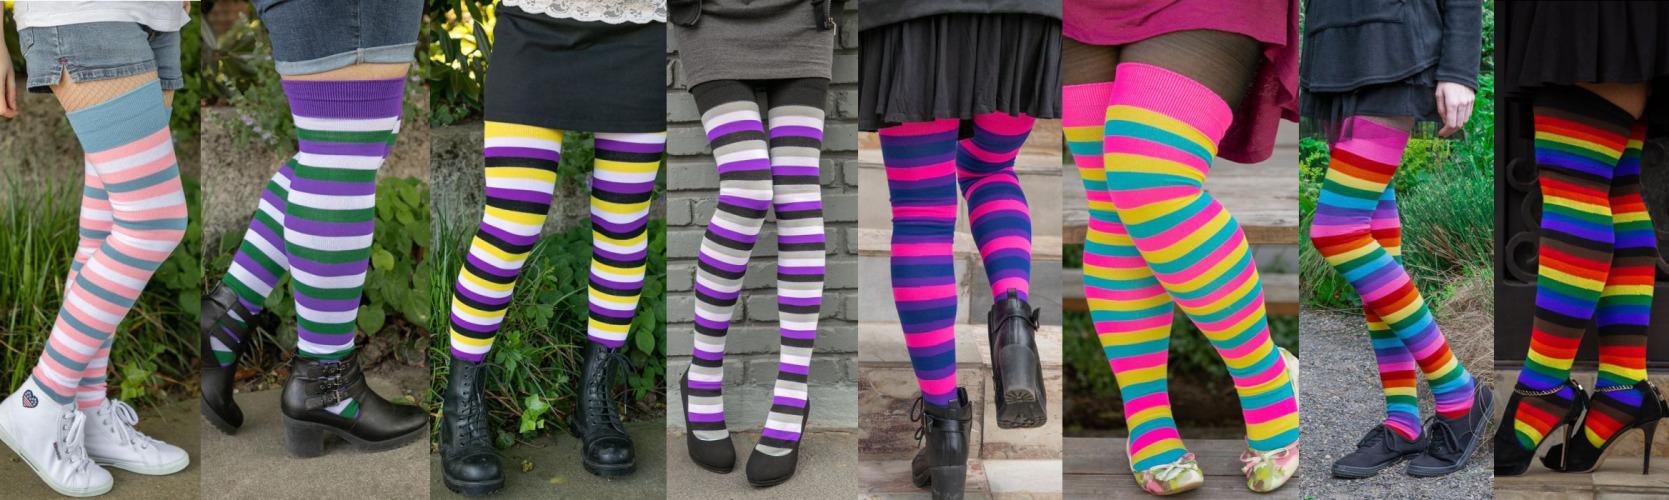 7b84b1d6b23 Dreamer Long Proud Stripes Tube Socks